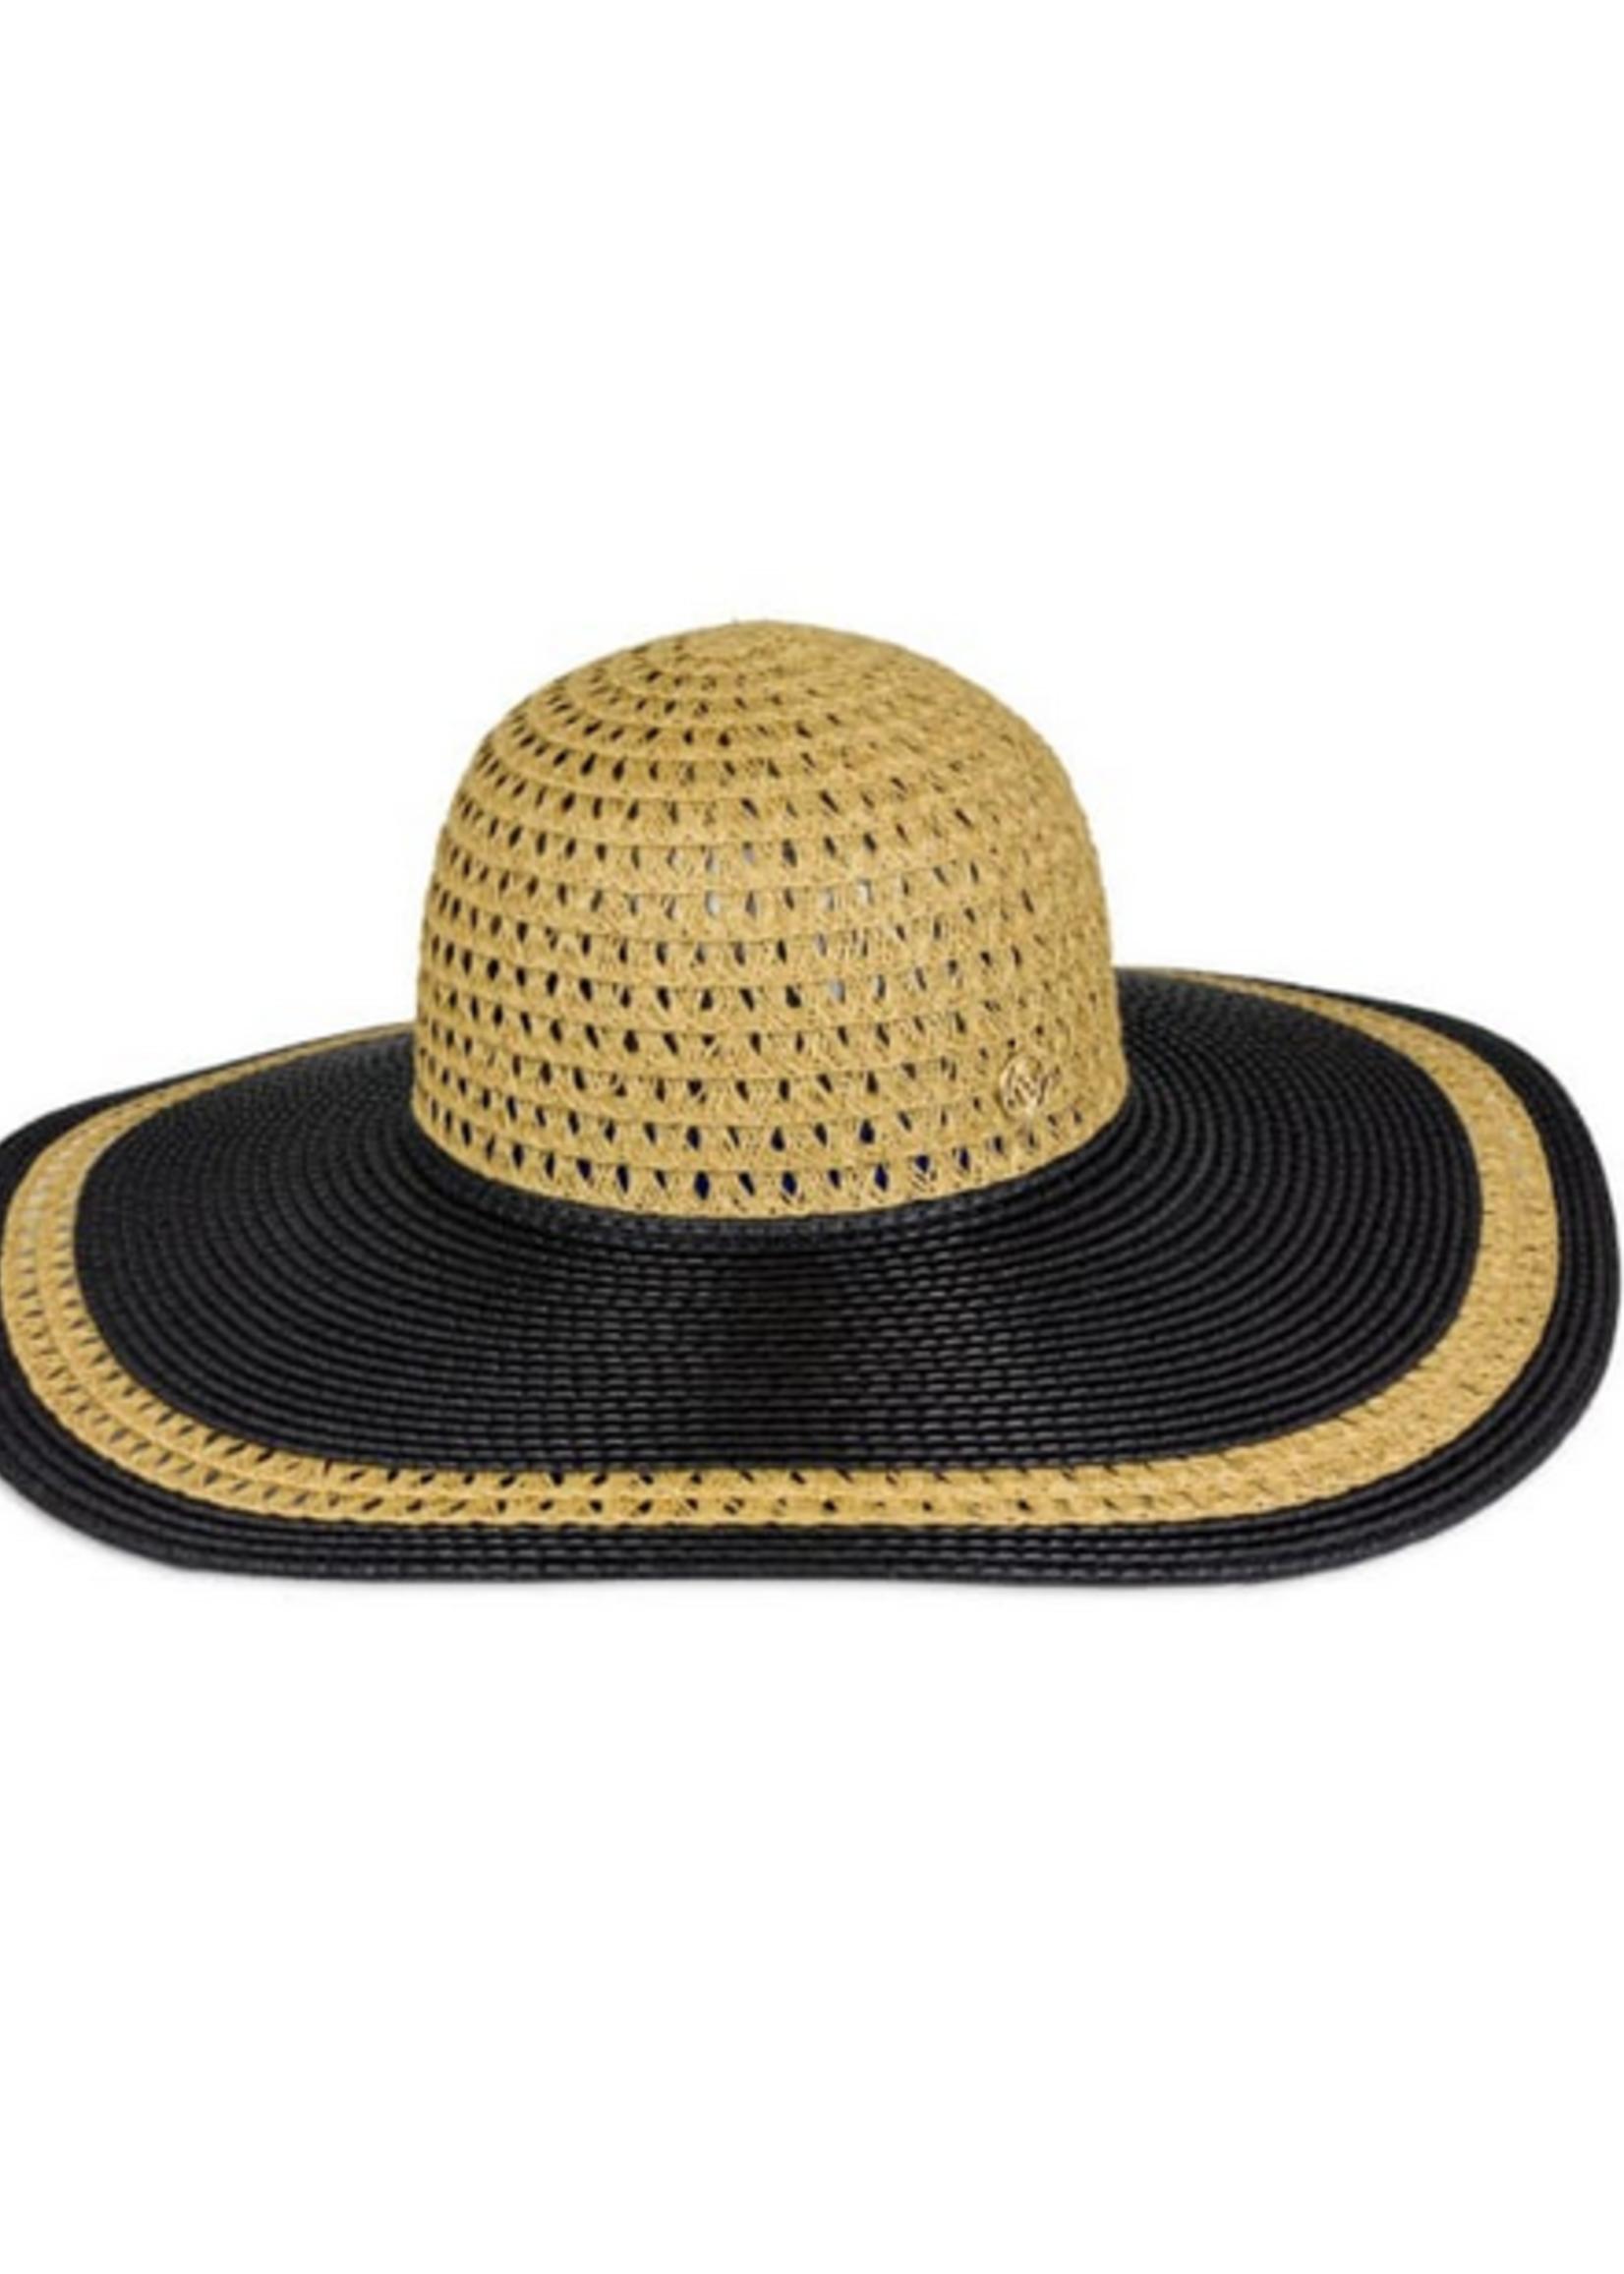 Elitaire Boutique The Charleston Sun Hat